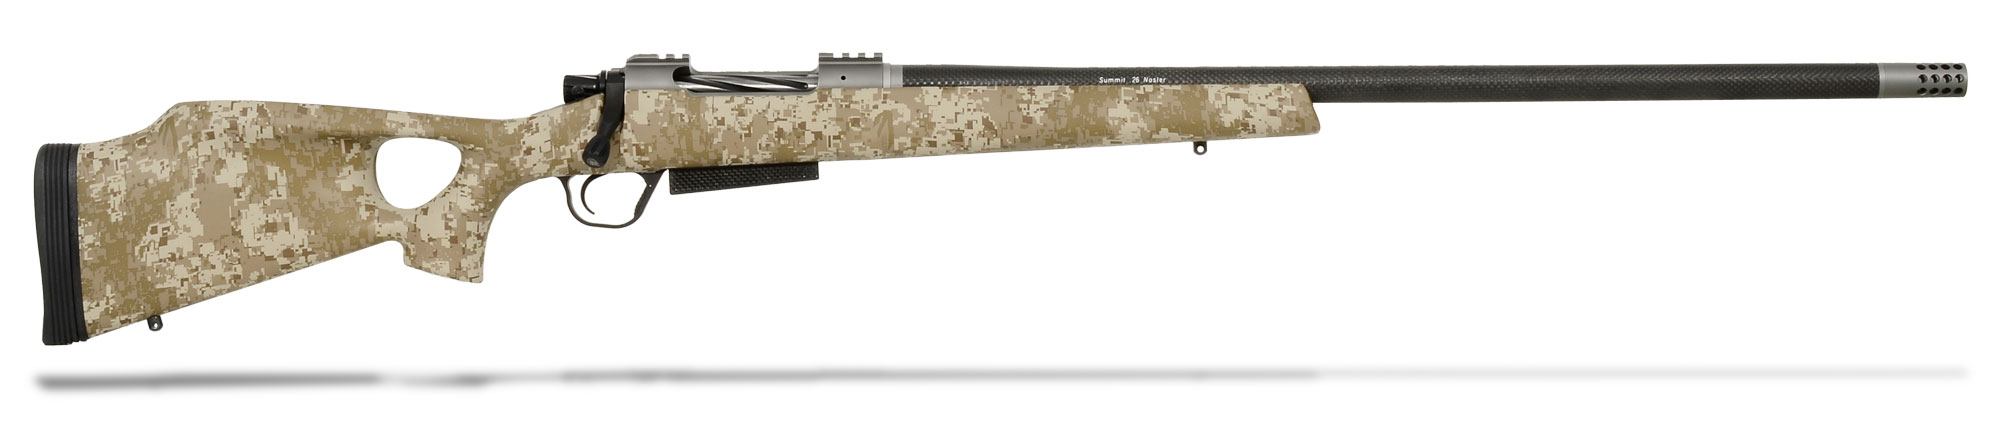 Christensen Arms Summit CF 6.5 Creedmoor Desert Digital Thumbhole Stock with Muzzle brake and Soft Case